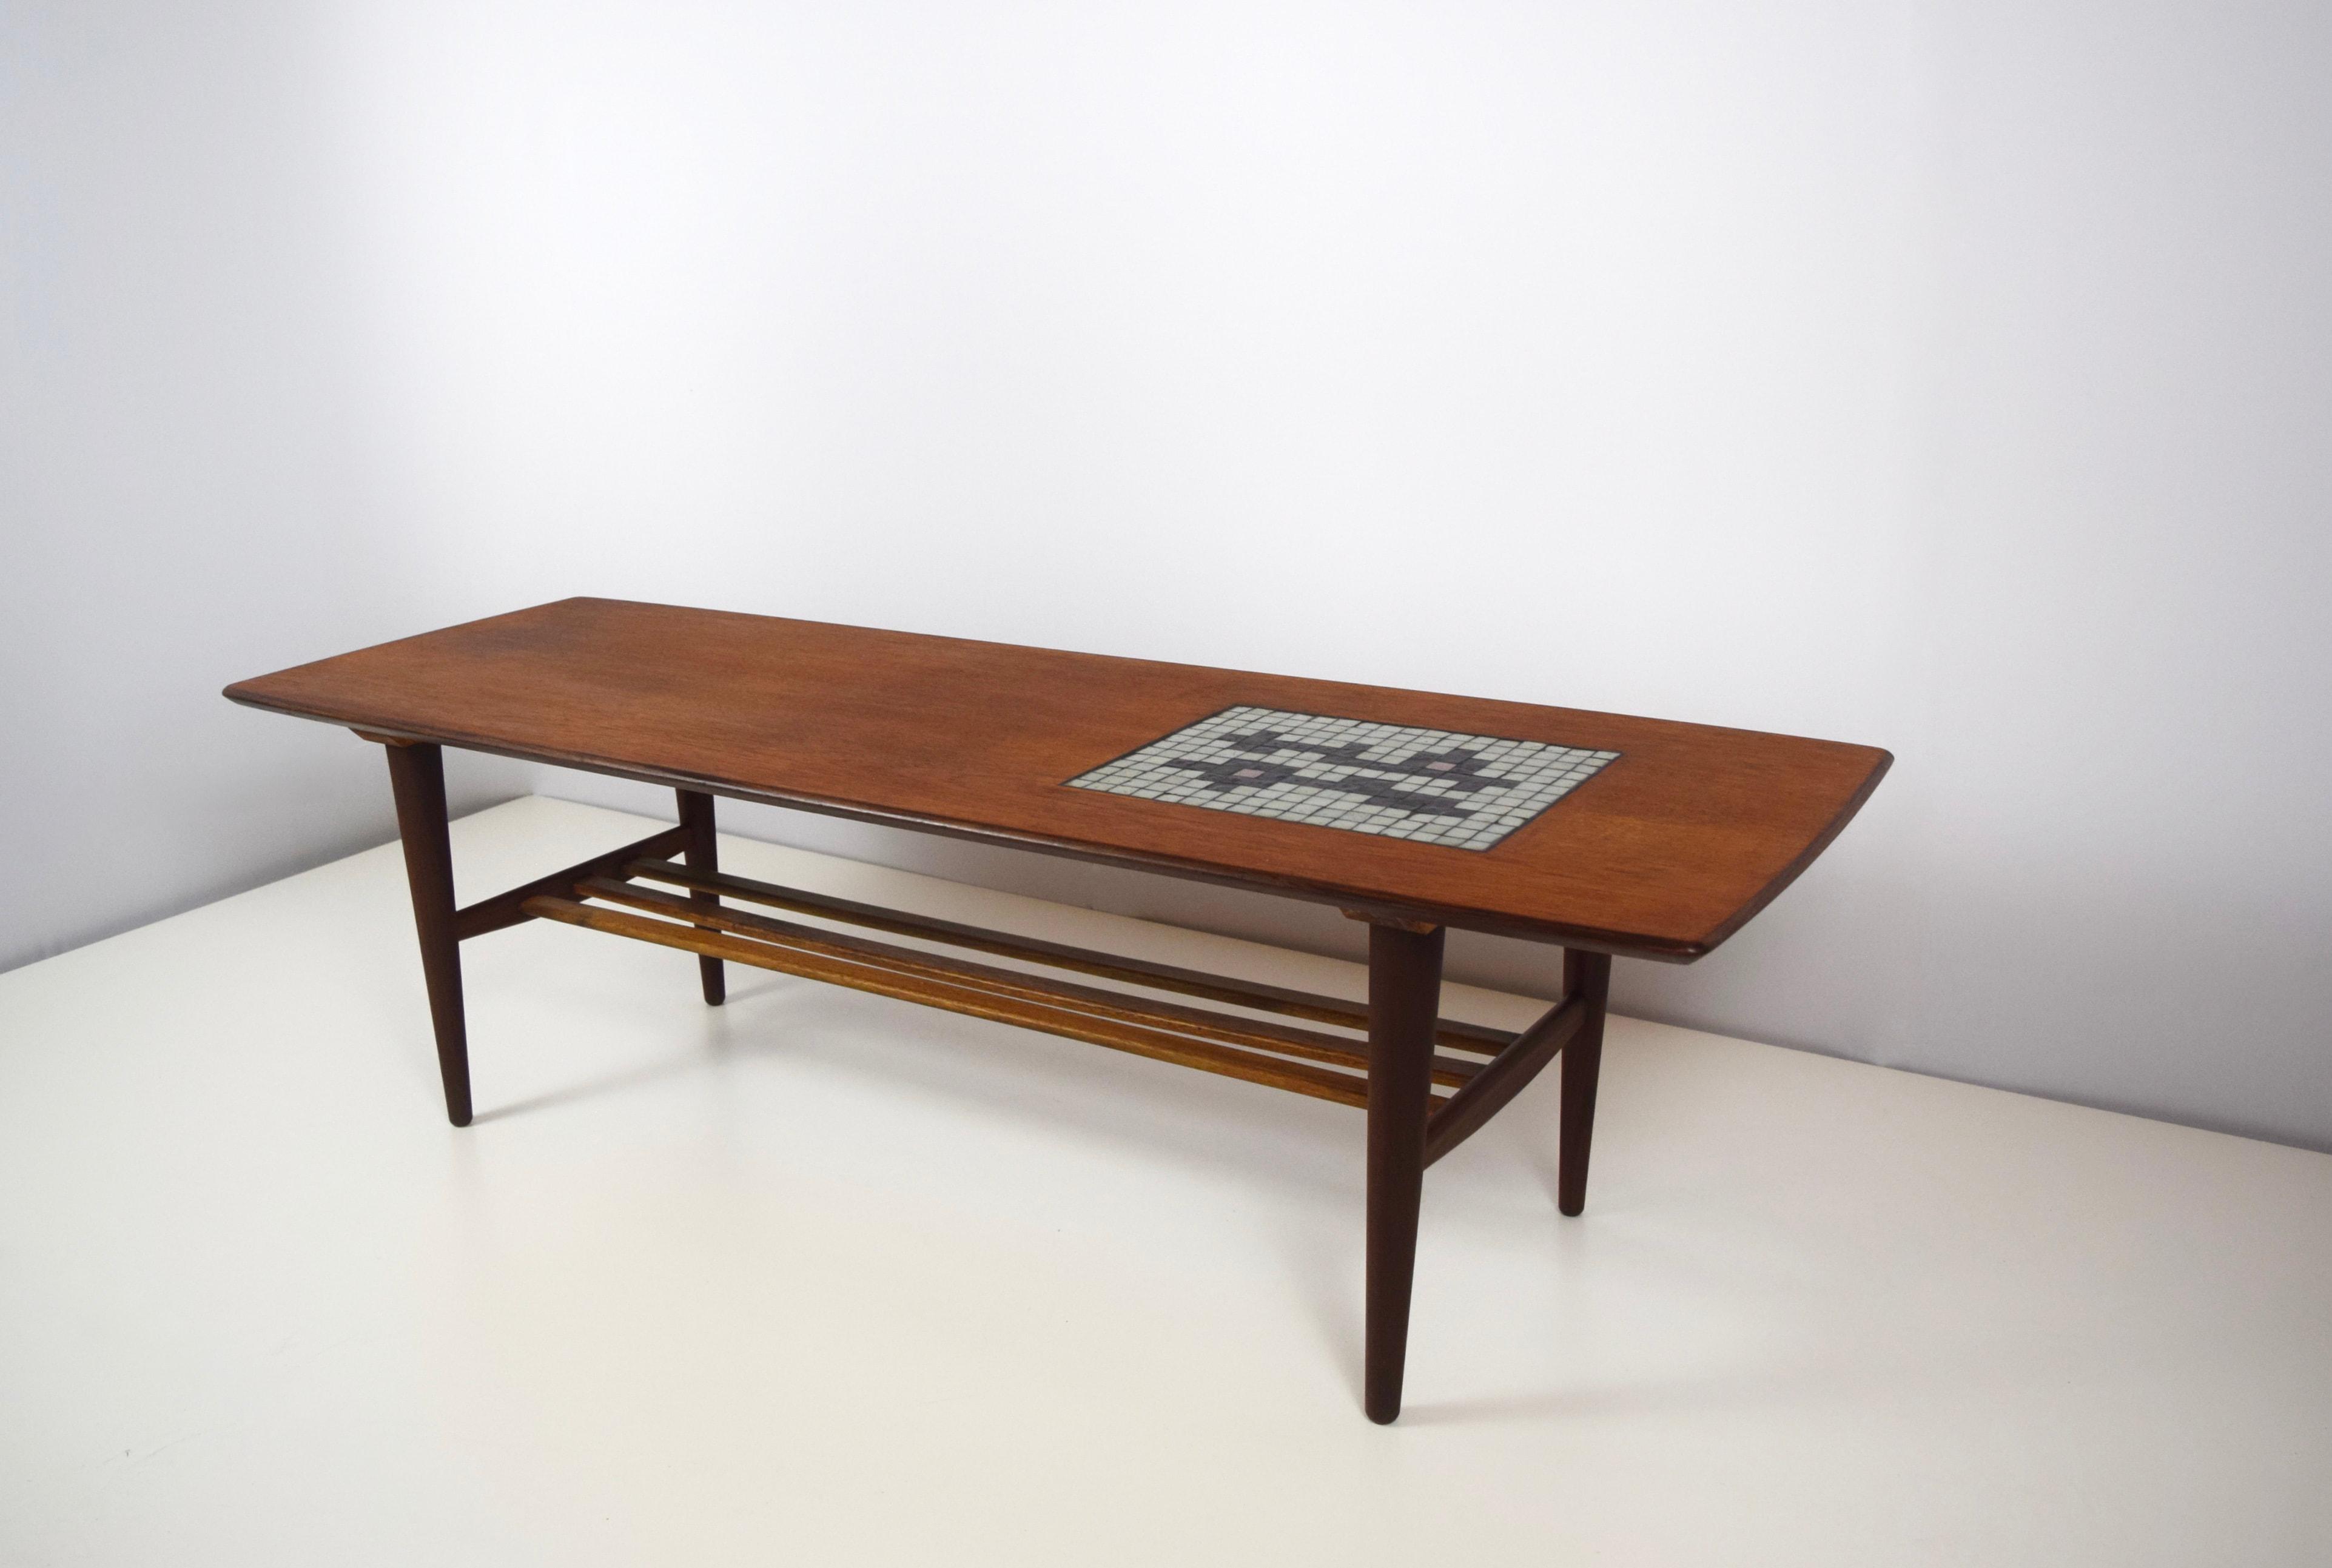 Coffee Table by Louis Van Teeffelen with Mosaic of Jaap Ravelli for Webe, 1950's